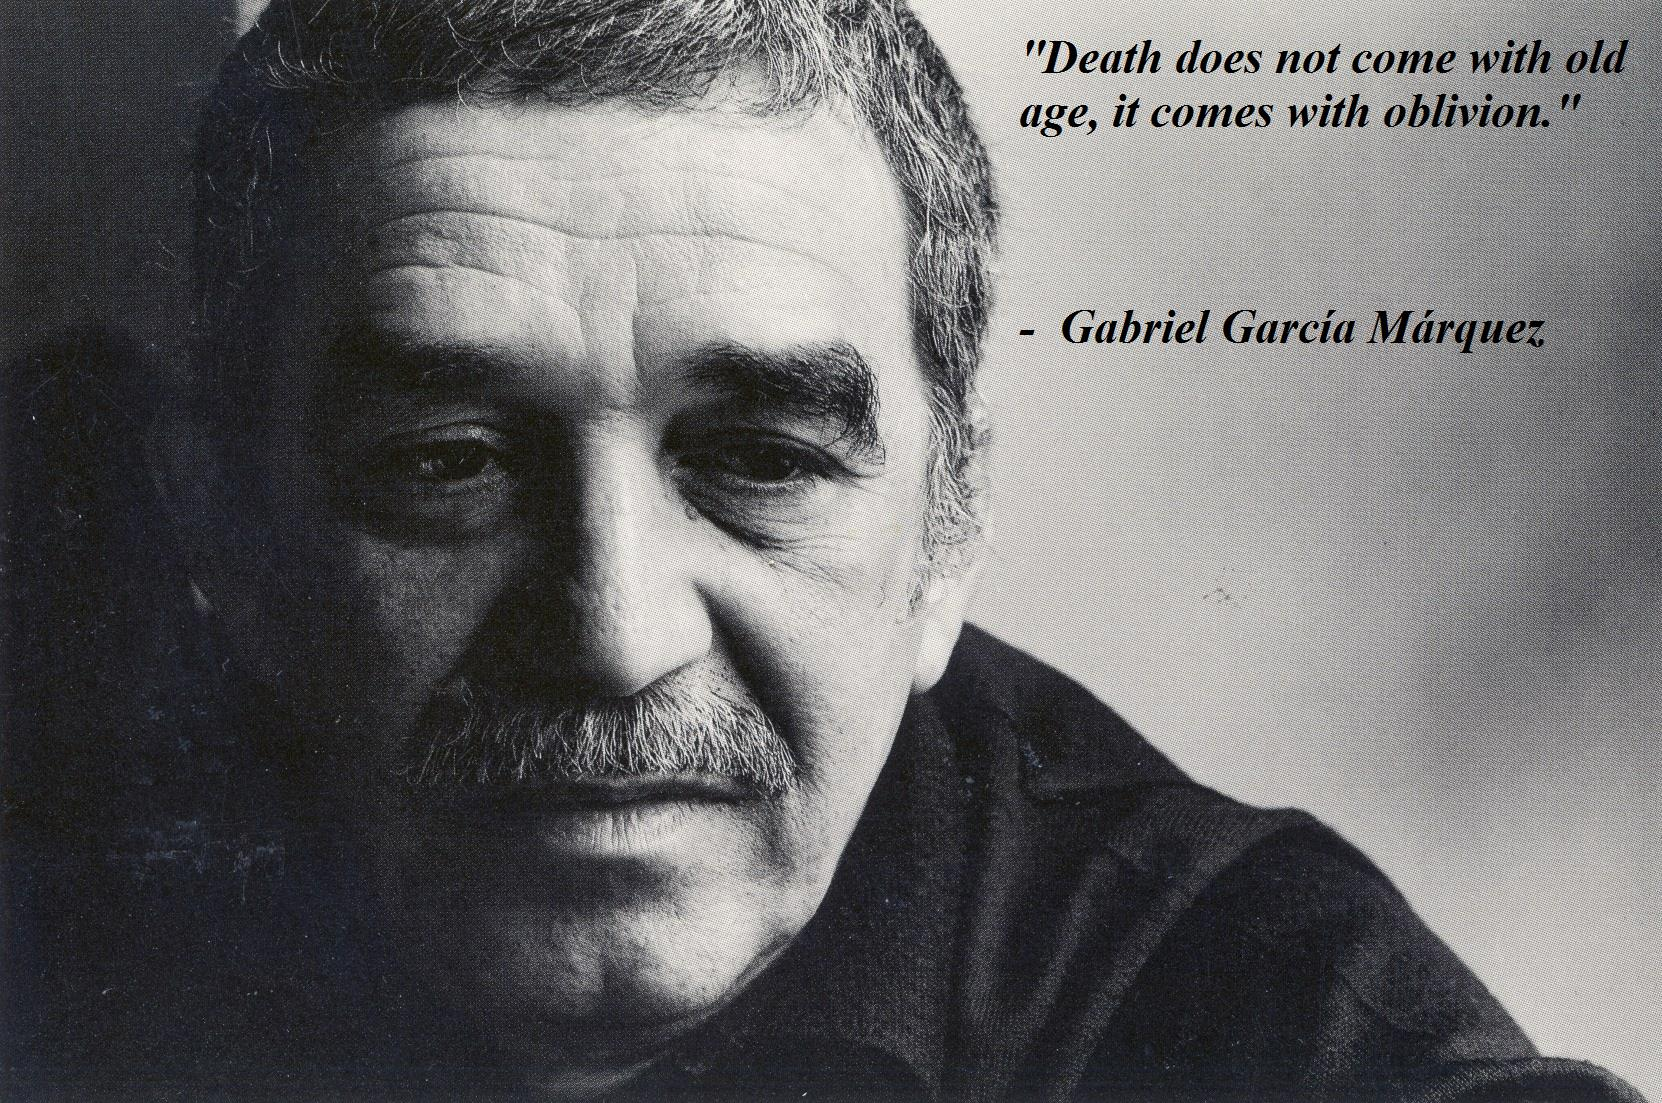 Gabriel Garcia Marquez's quote #6